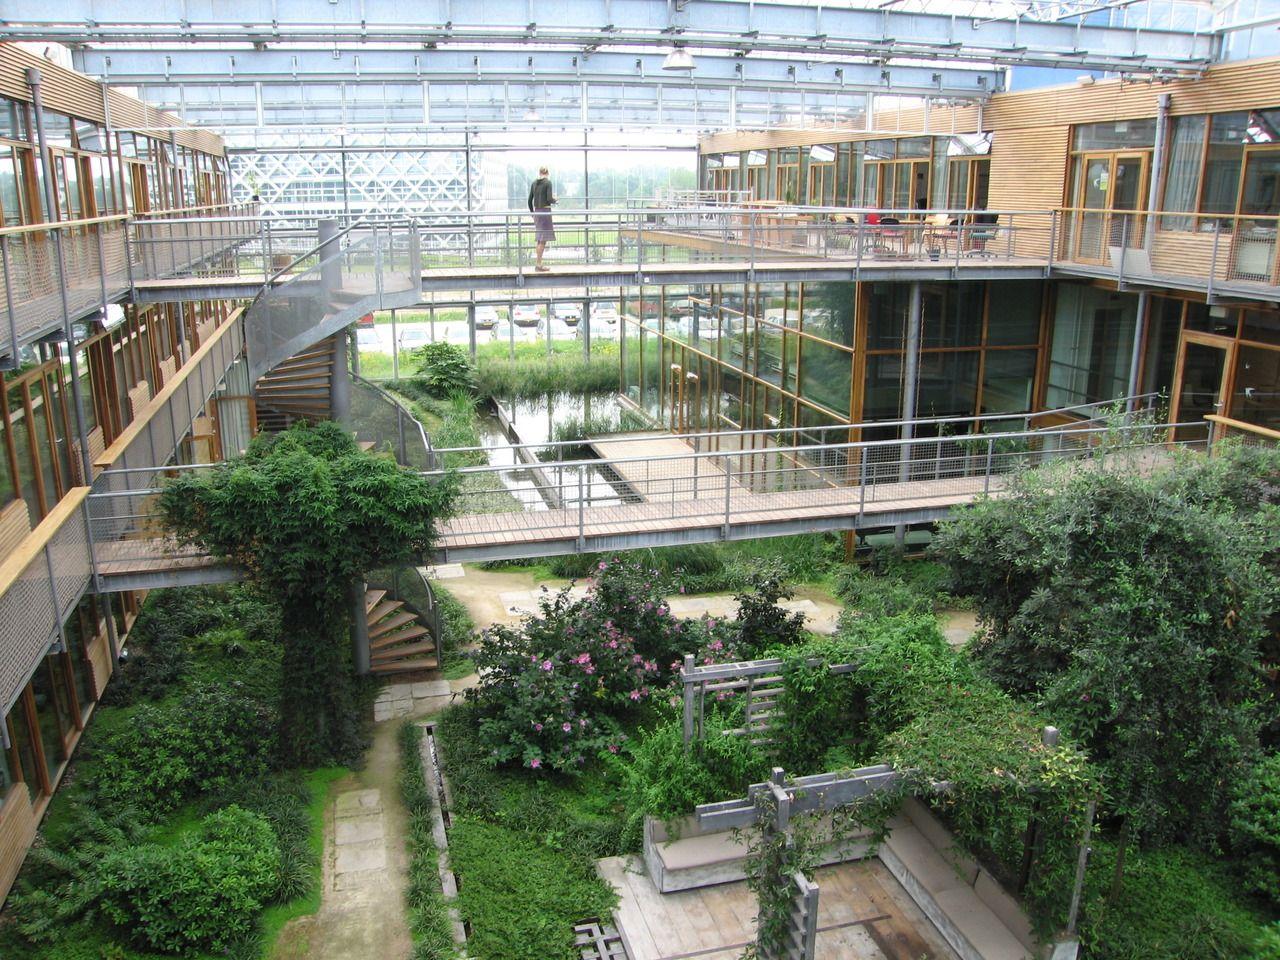 Building Architecture · Wageningen University Greenhouse